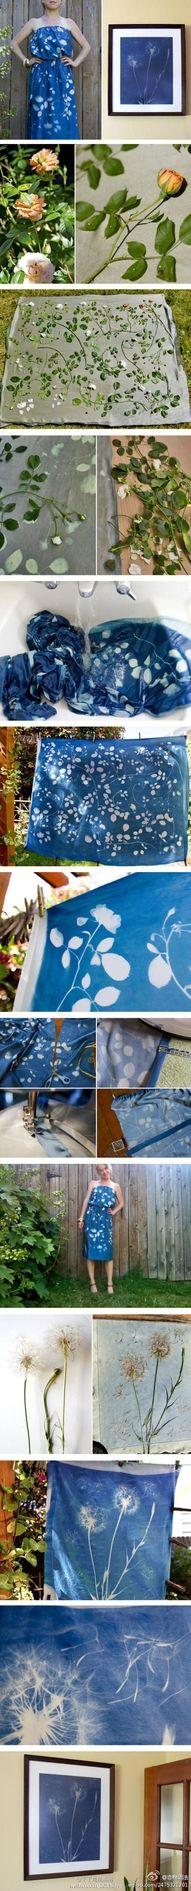 amazing!!: Diy Ideas, Crafts Ideas, Prints Fabrics, Sunprints, Flowers Prints, Dresses, Ties Dyes, Sun Di Fabrics, Sun Prints